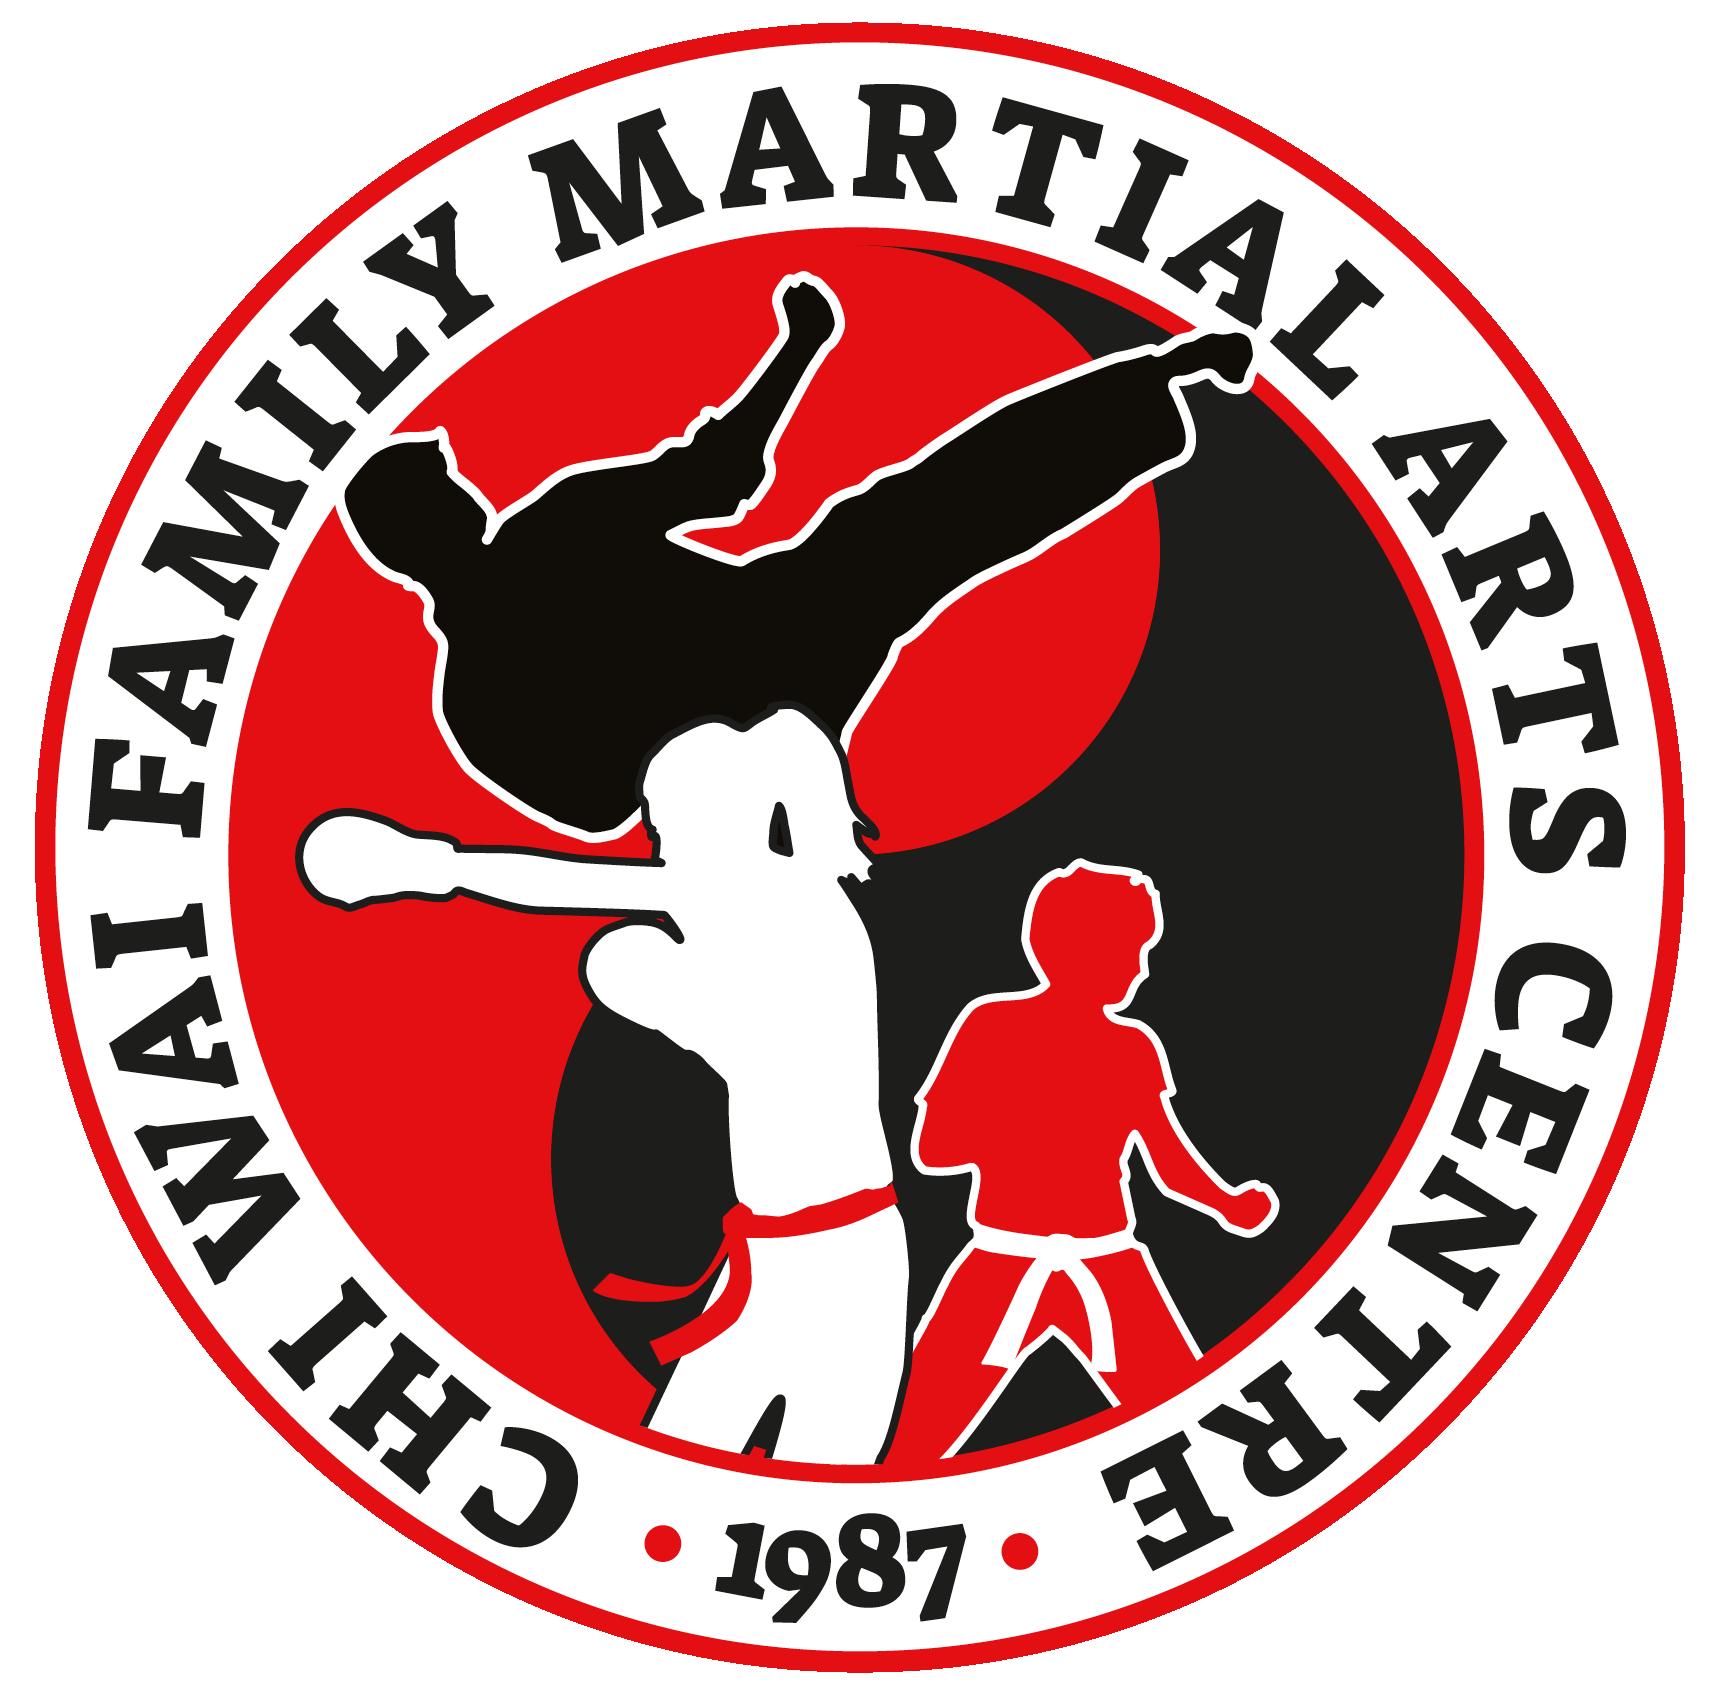 Chi Wai Family Martial Arts Centre